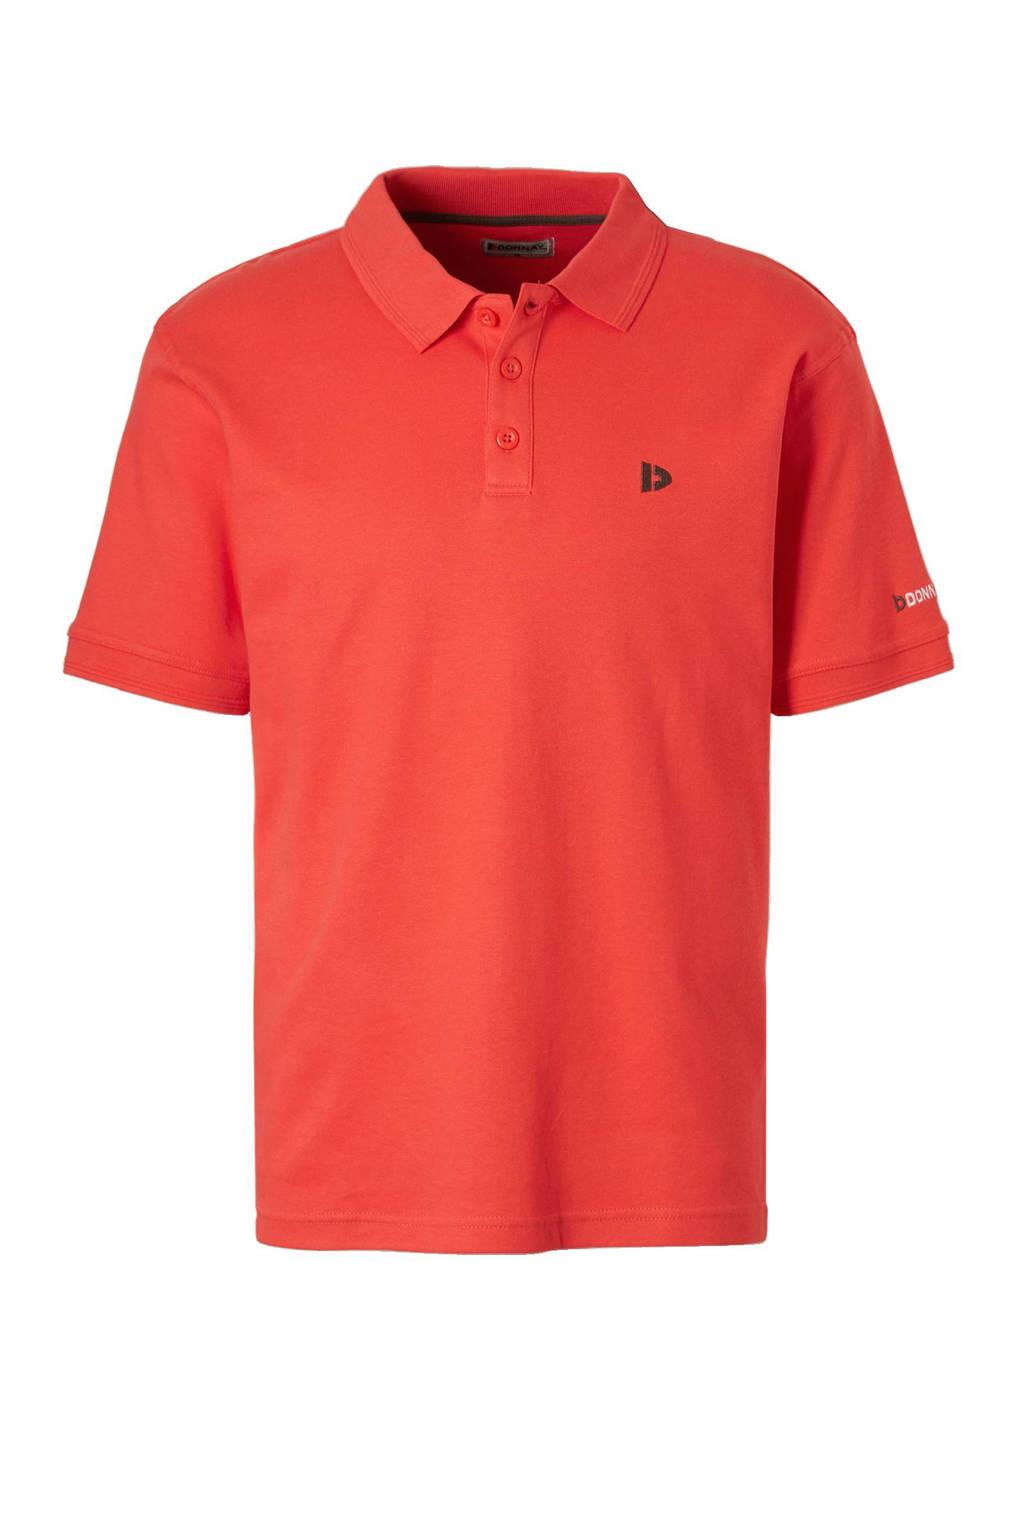 Donnay   sportpolo oranje, Koraalrood